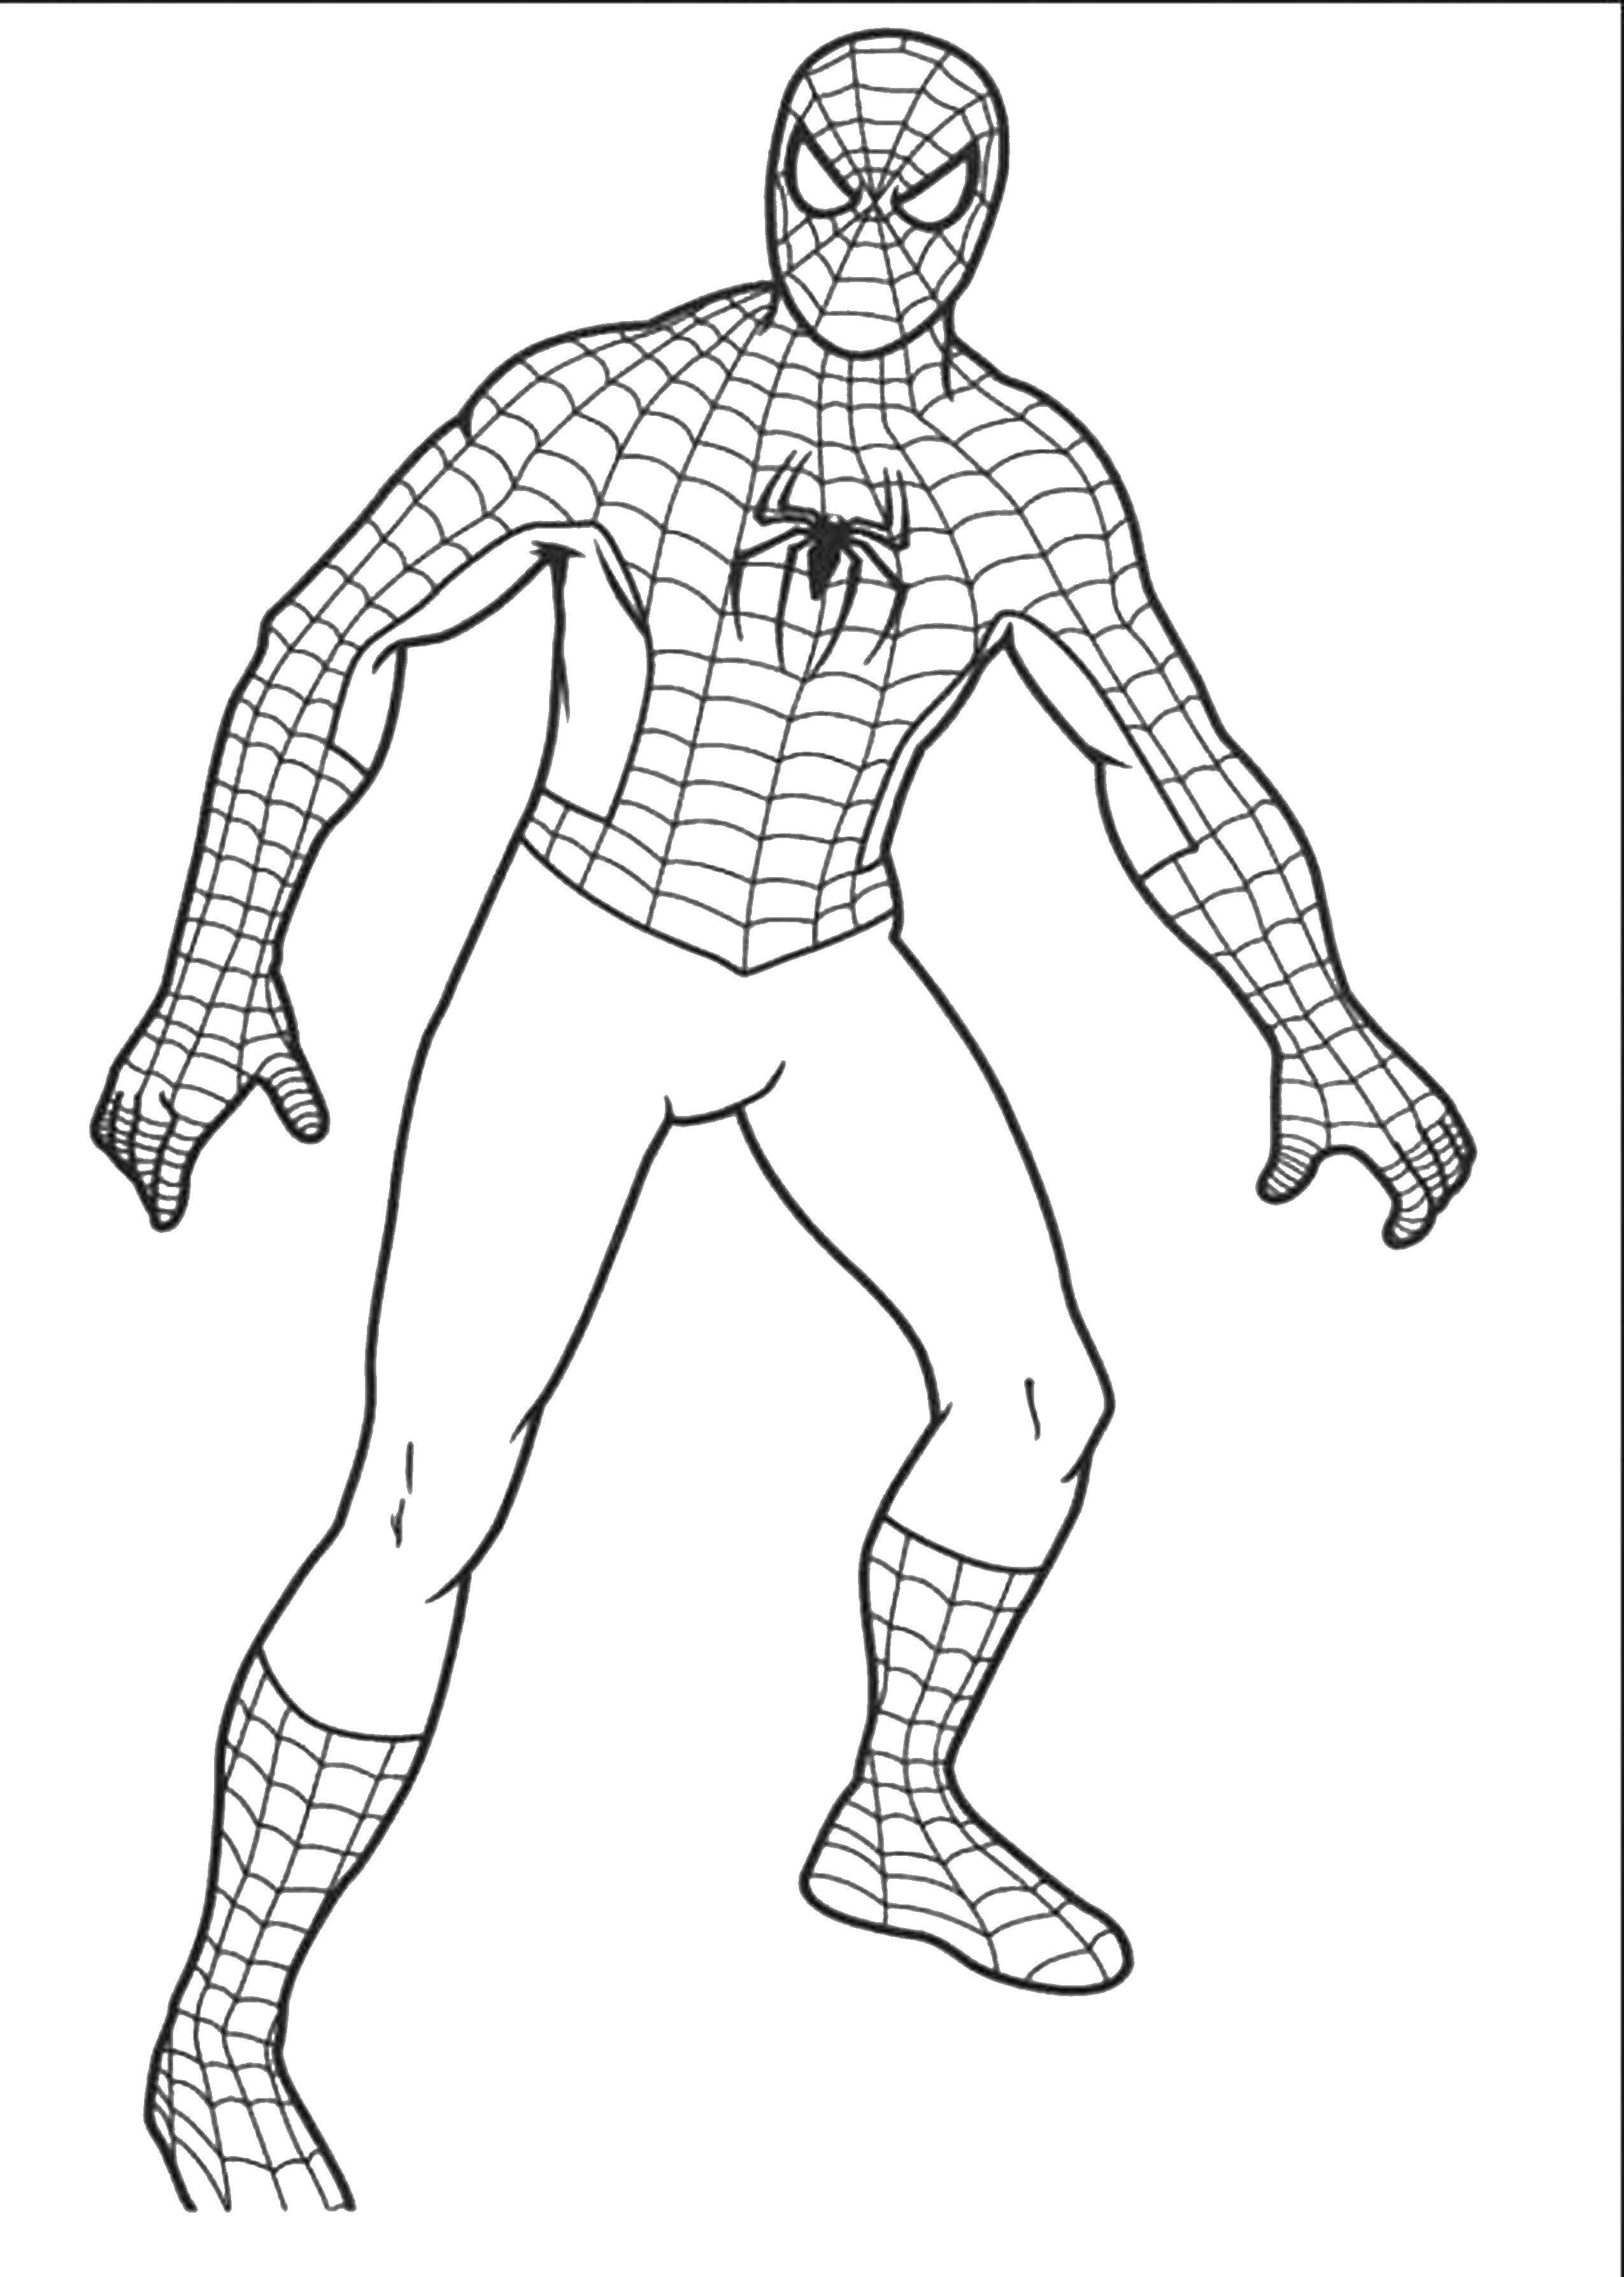 раскраски раскраска человек паук человек паук сайт раскрасок